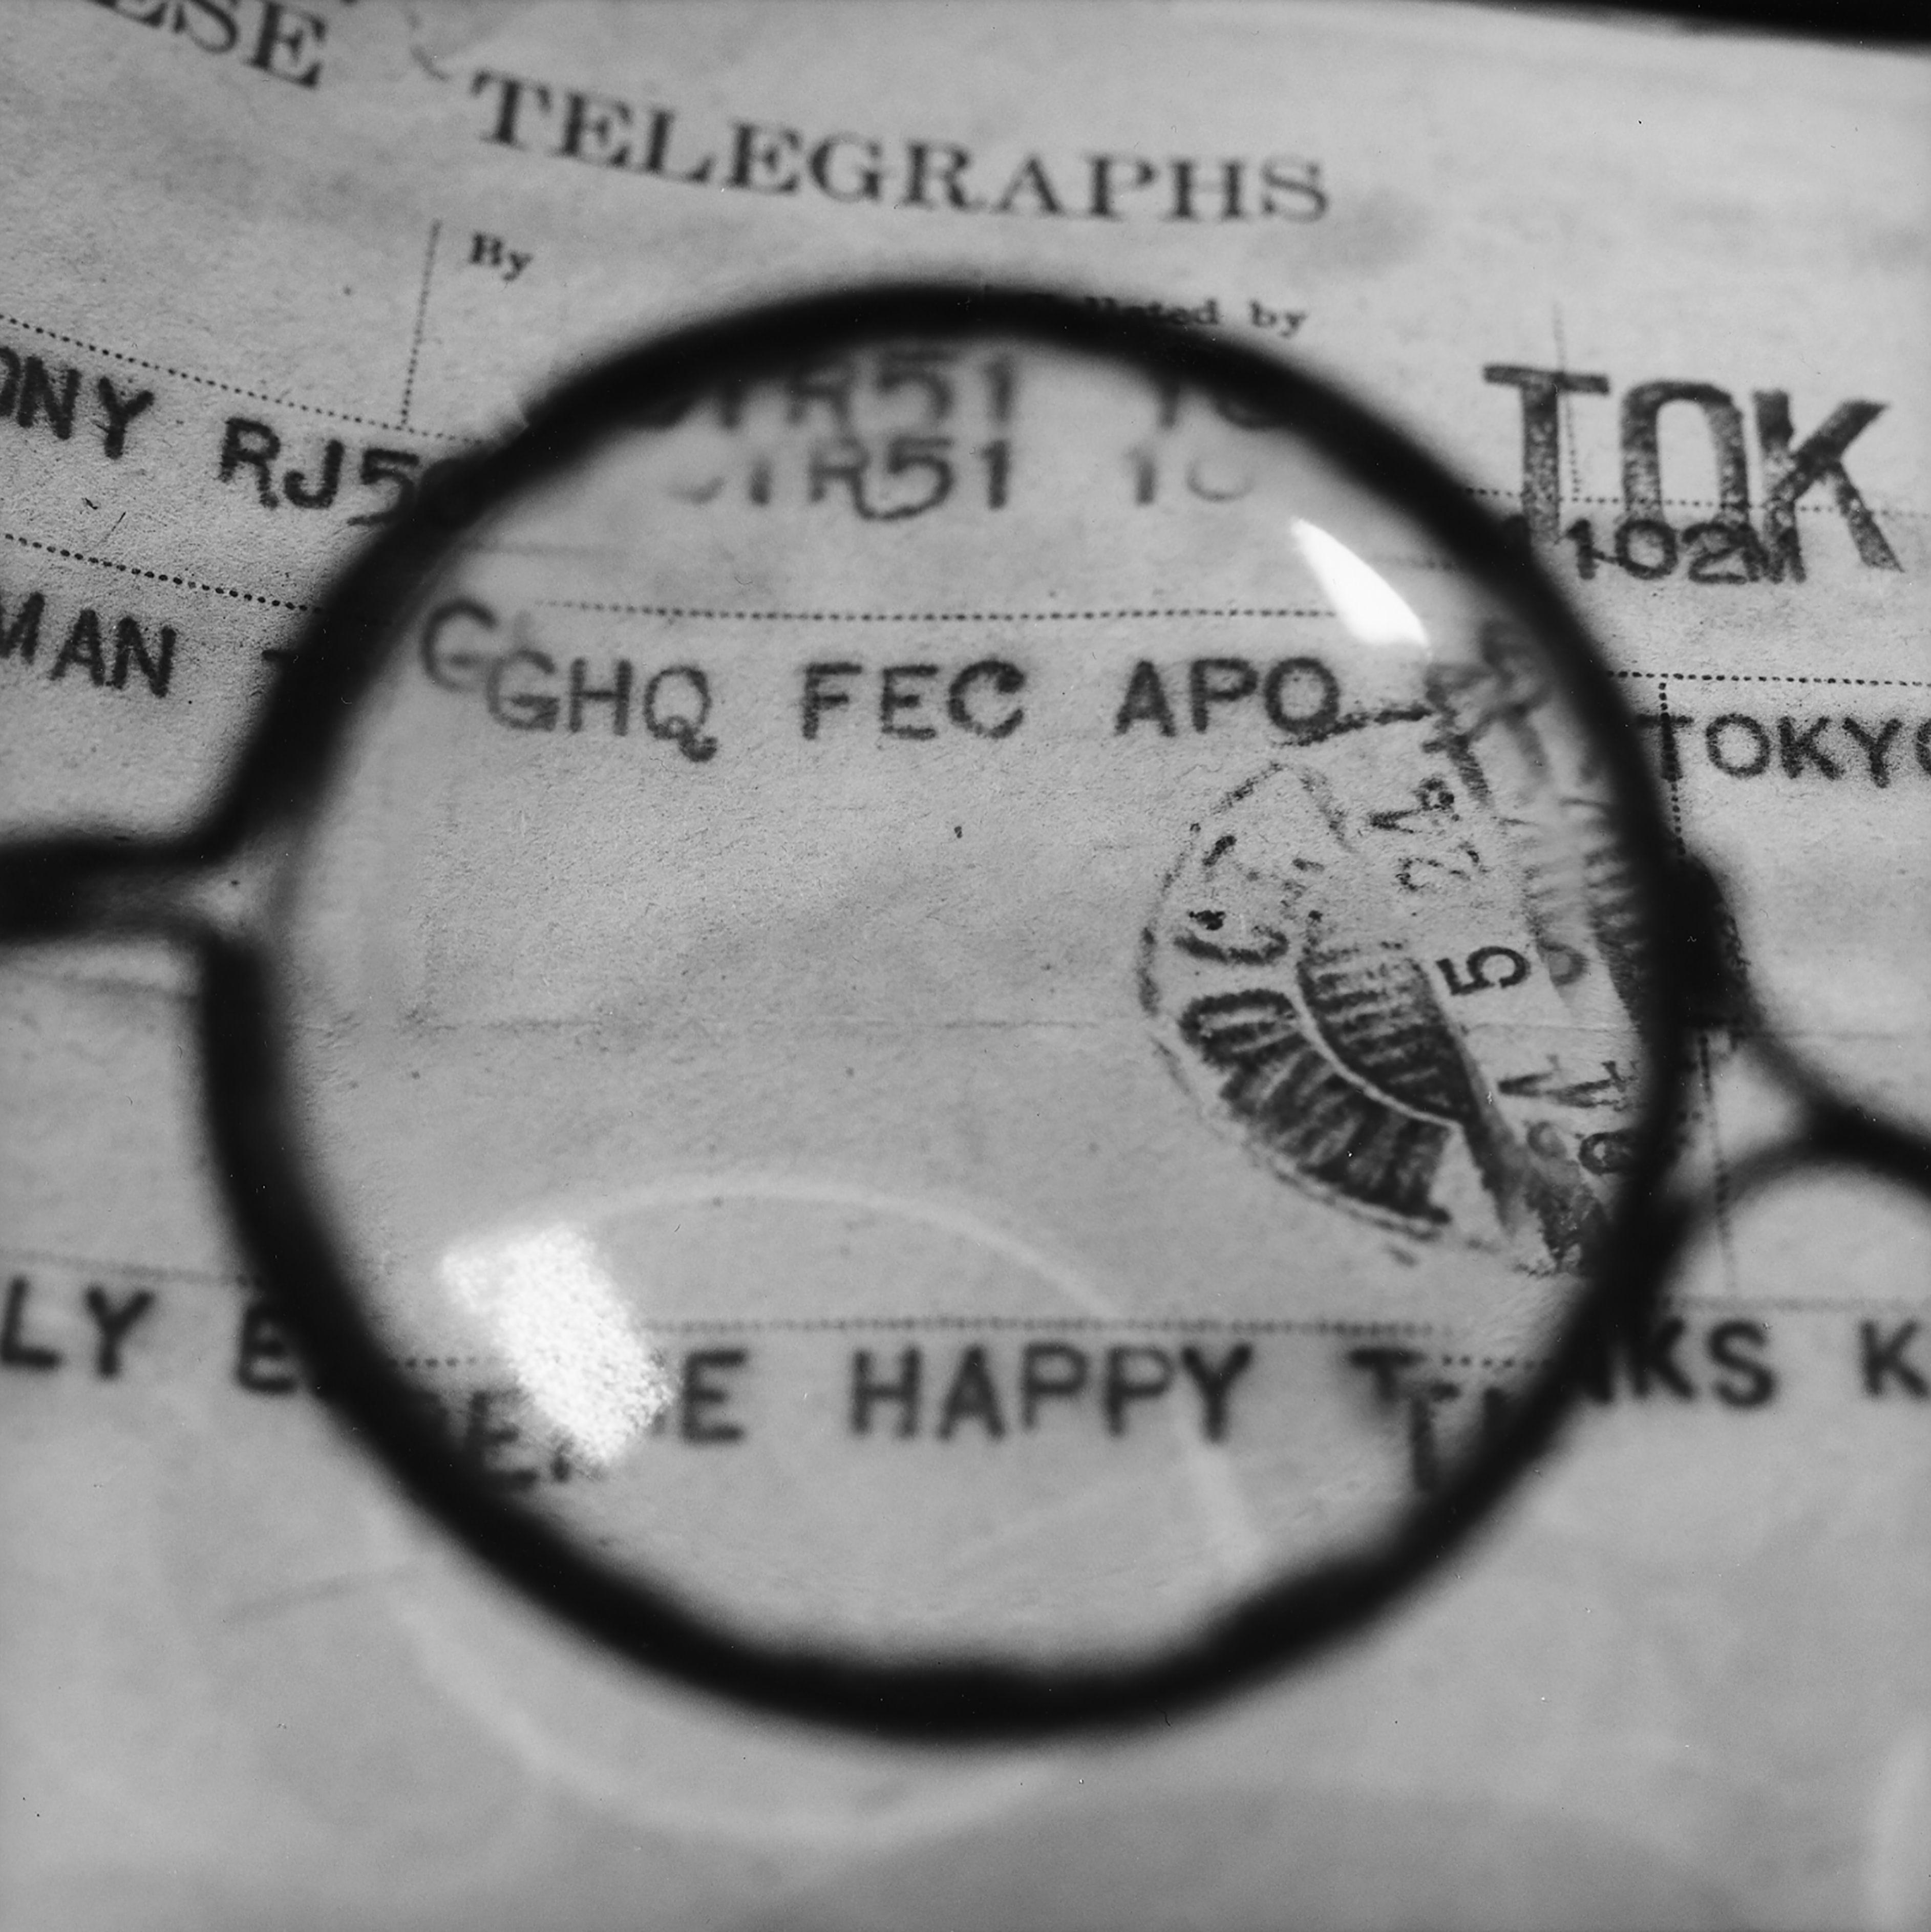 Foujita's Glasses - Viewing a telegram he sent to GHQ officer Sherman who helped him leave Japan by Tomoko Yoneda